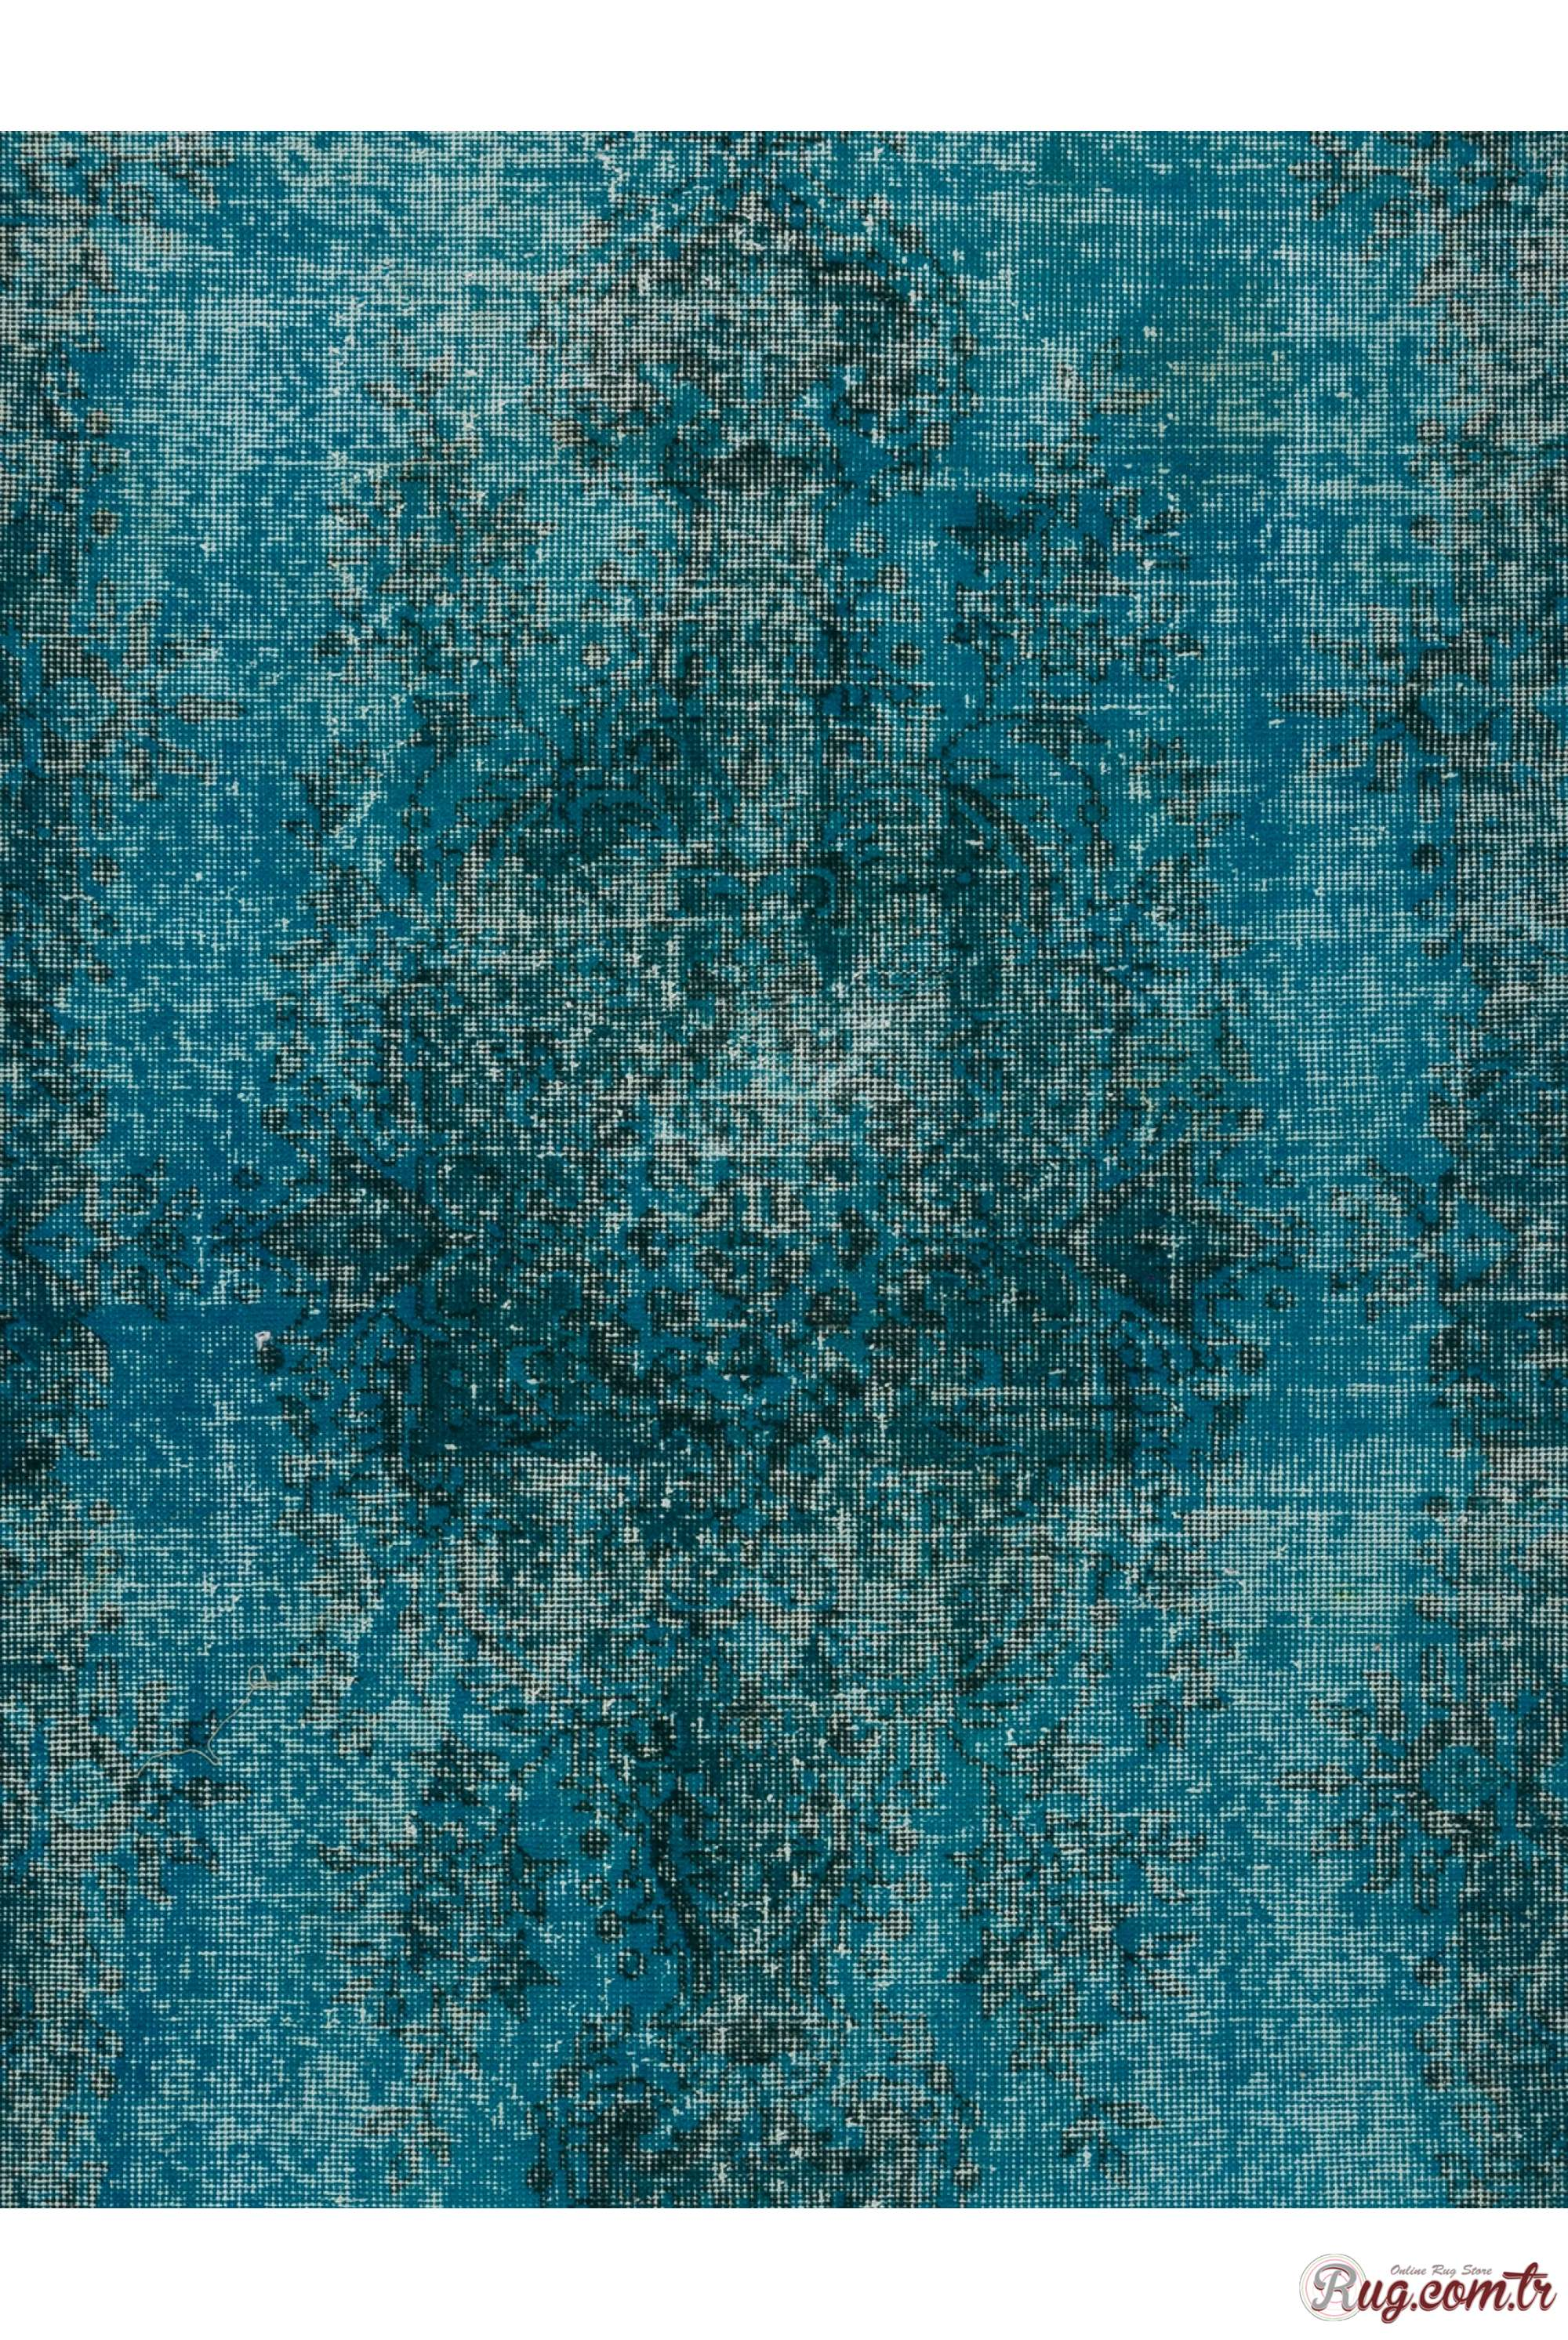 3 9 X 7 115 212 Cm Bondi Blue Color